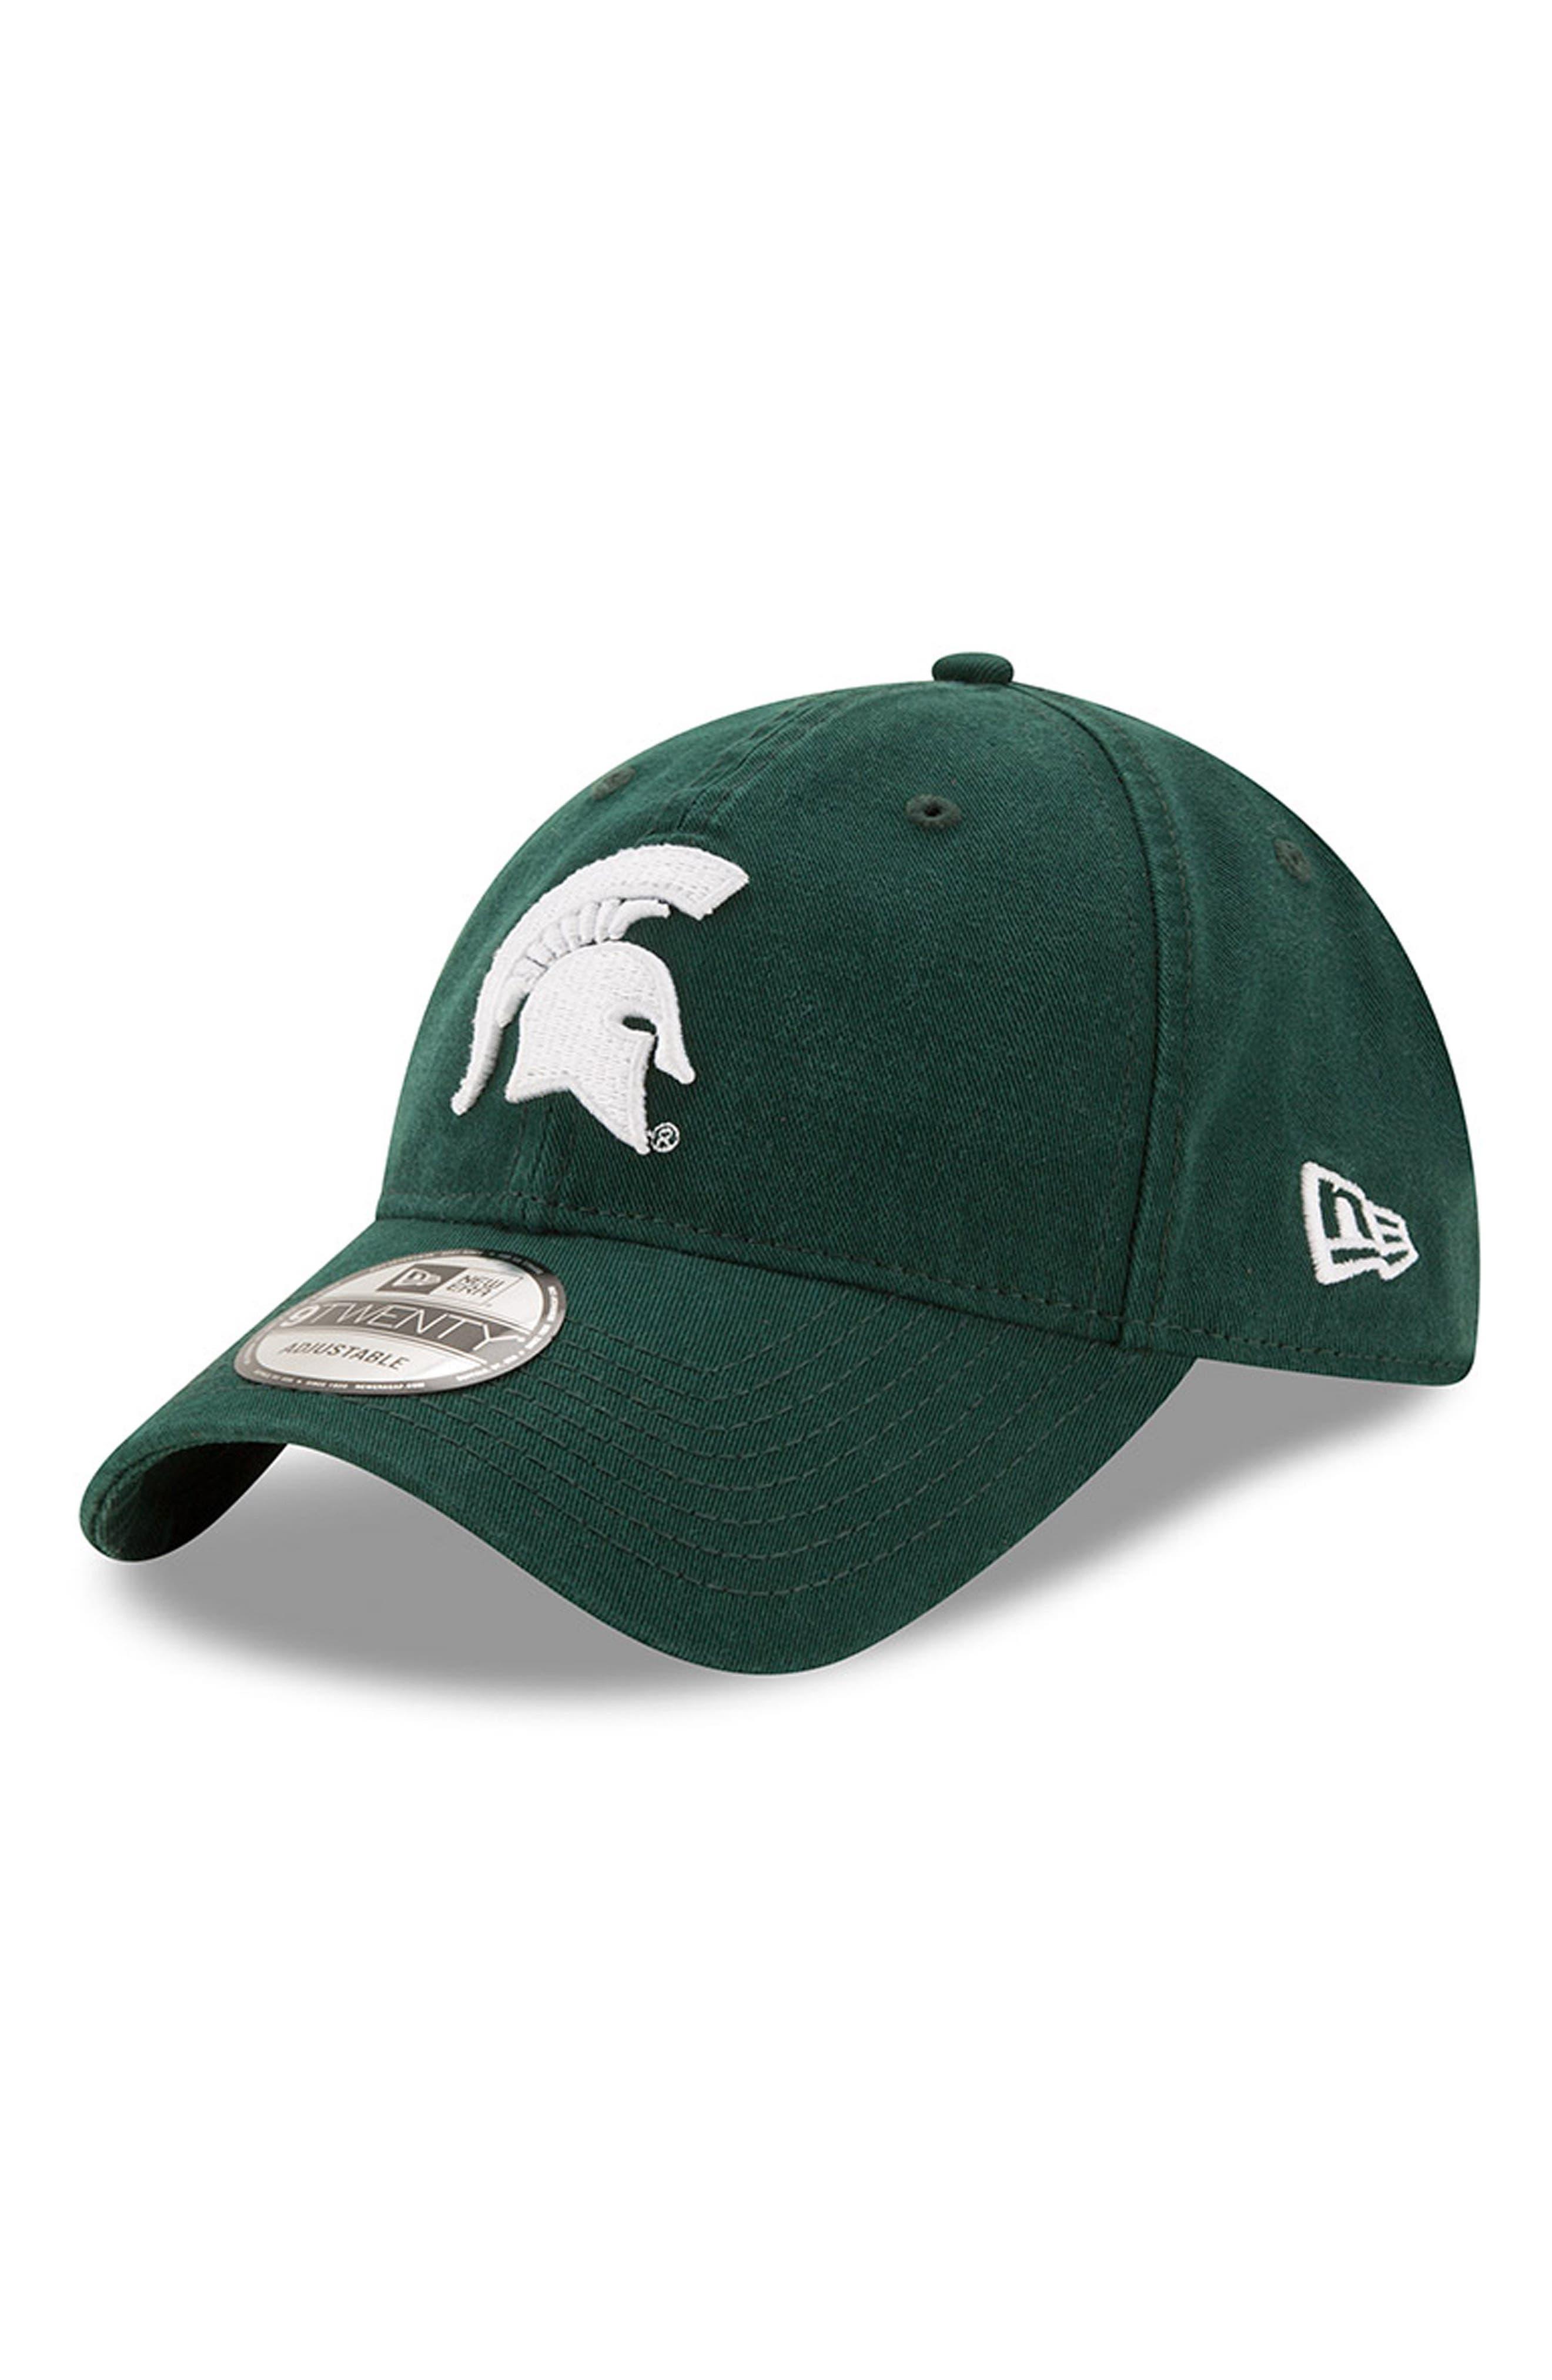 Alternate Image 1 Selected - New Era Collegiate Core Classic - Michigan State Spartans Baseball Cap